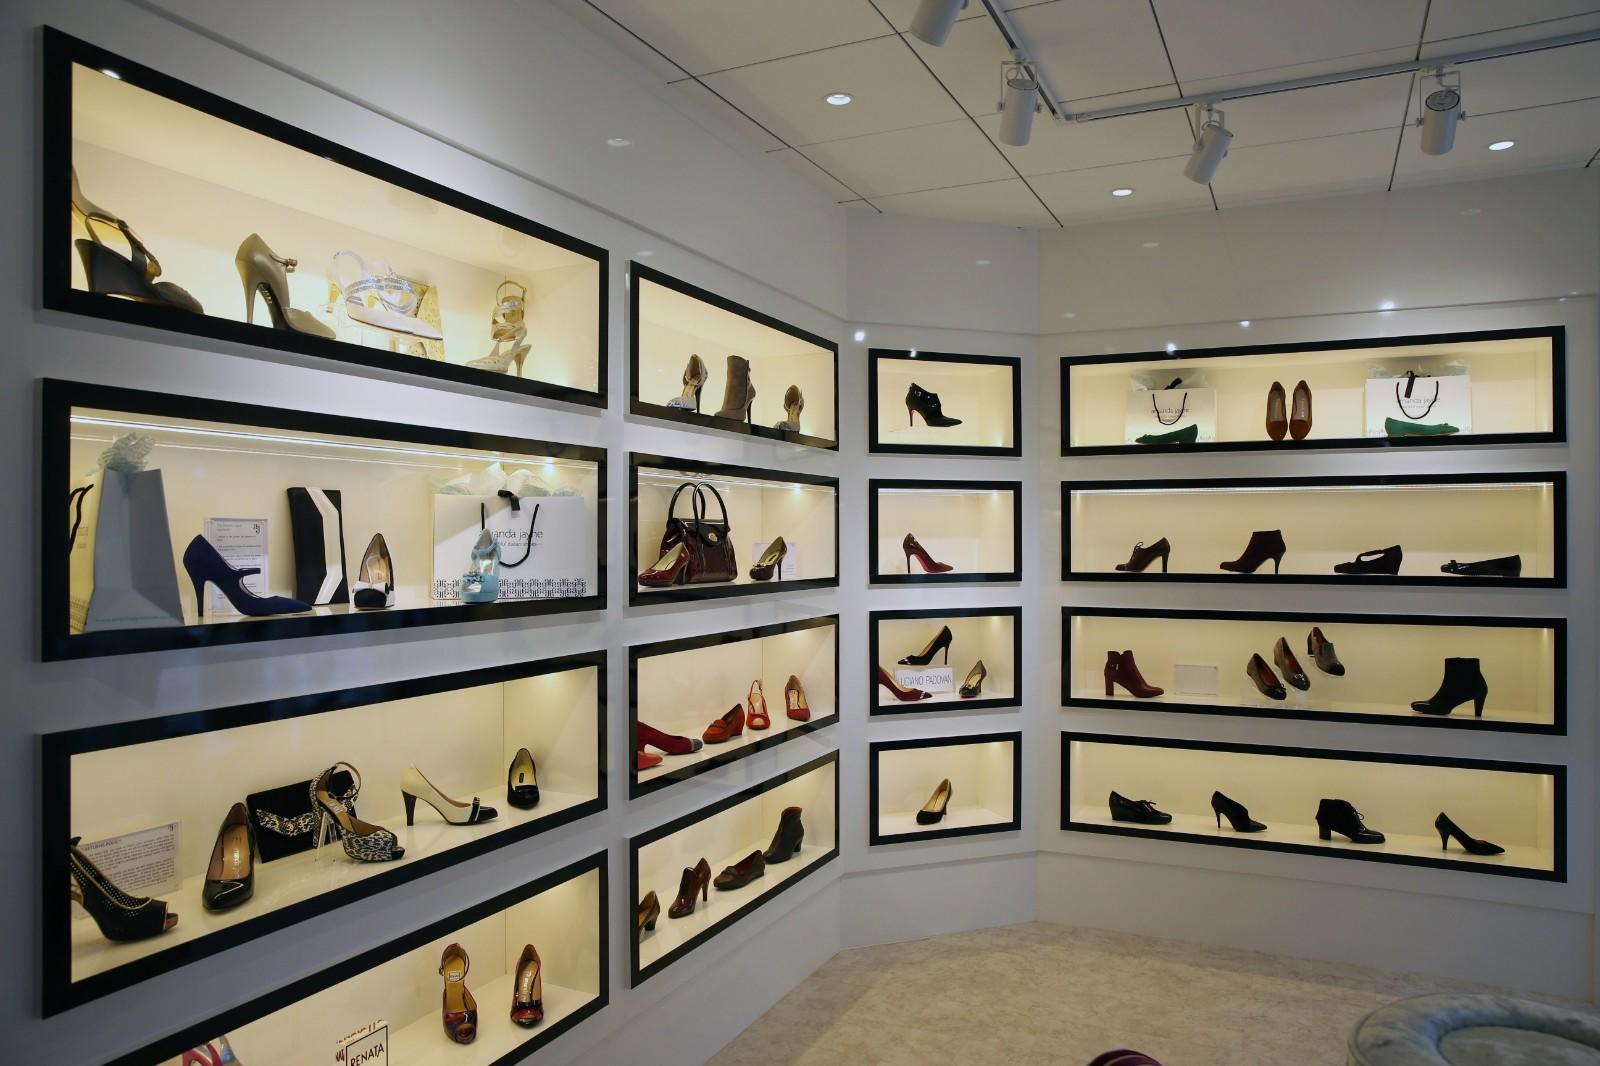 OUYEE chic shoe shop interior design popular for chain shop-1